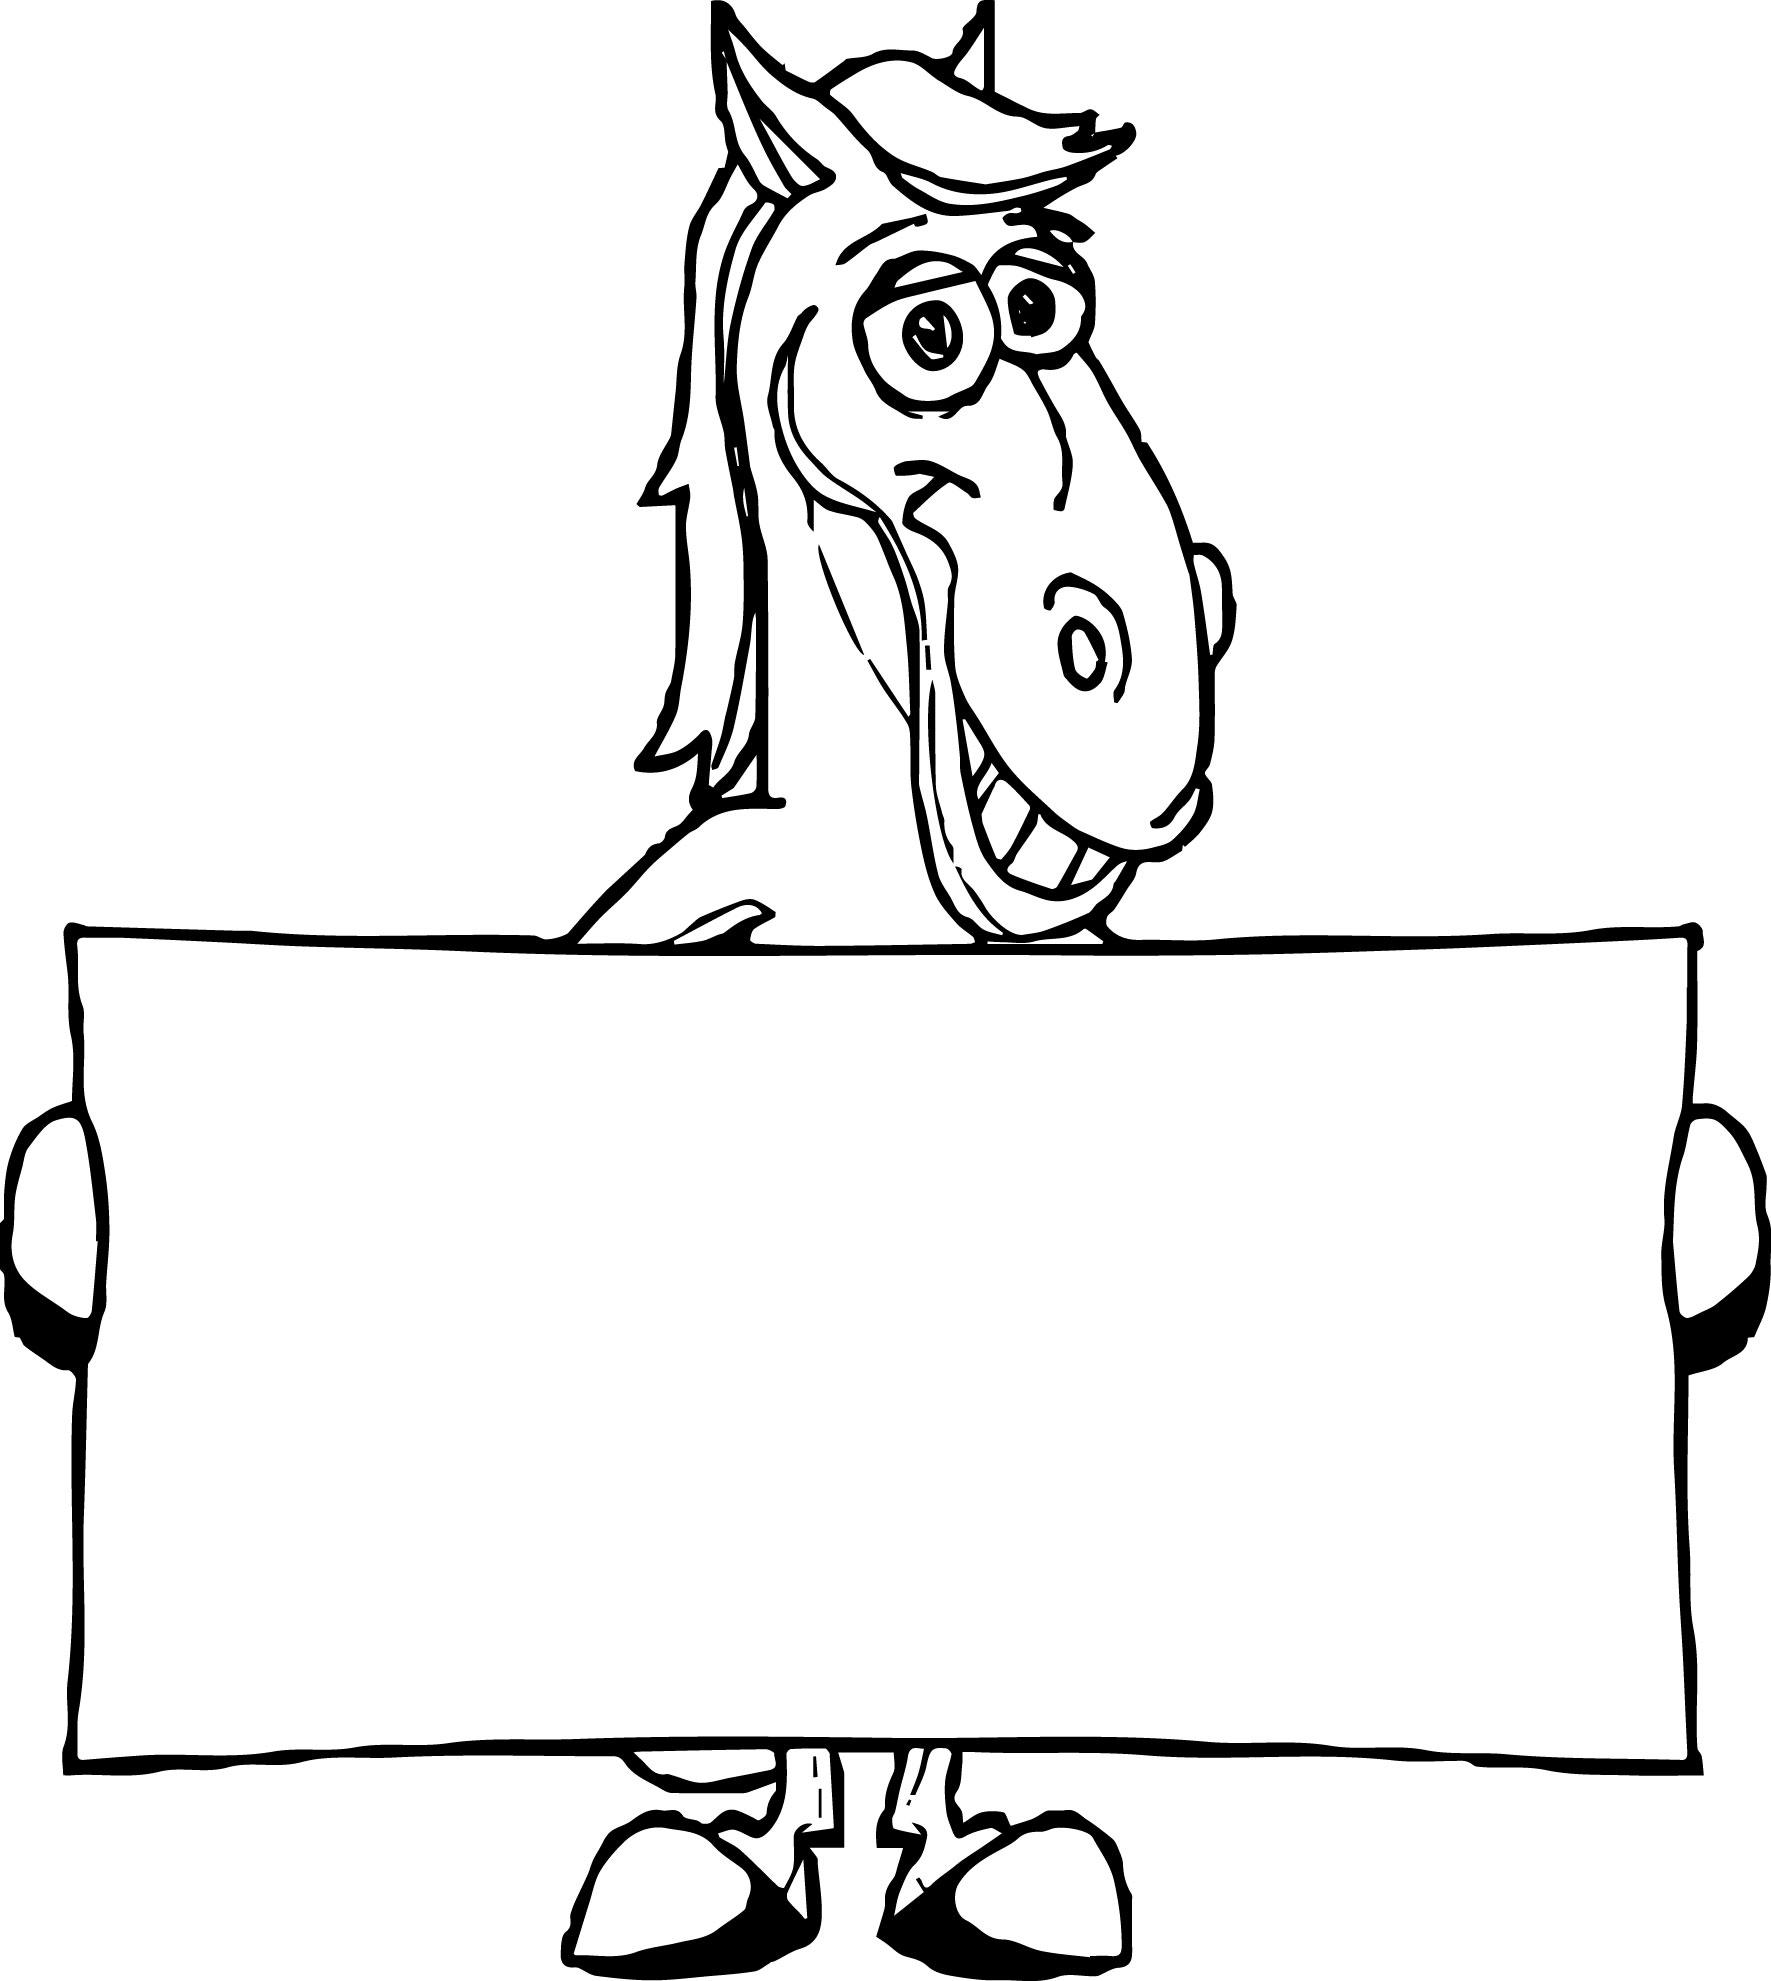 Cartoon Horse Coloring Page 26